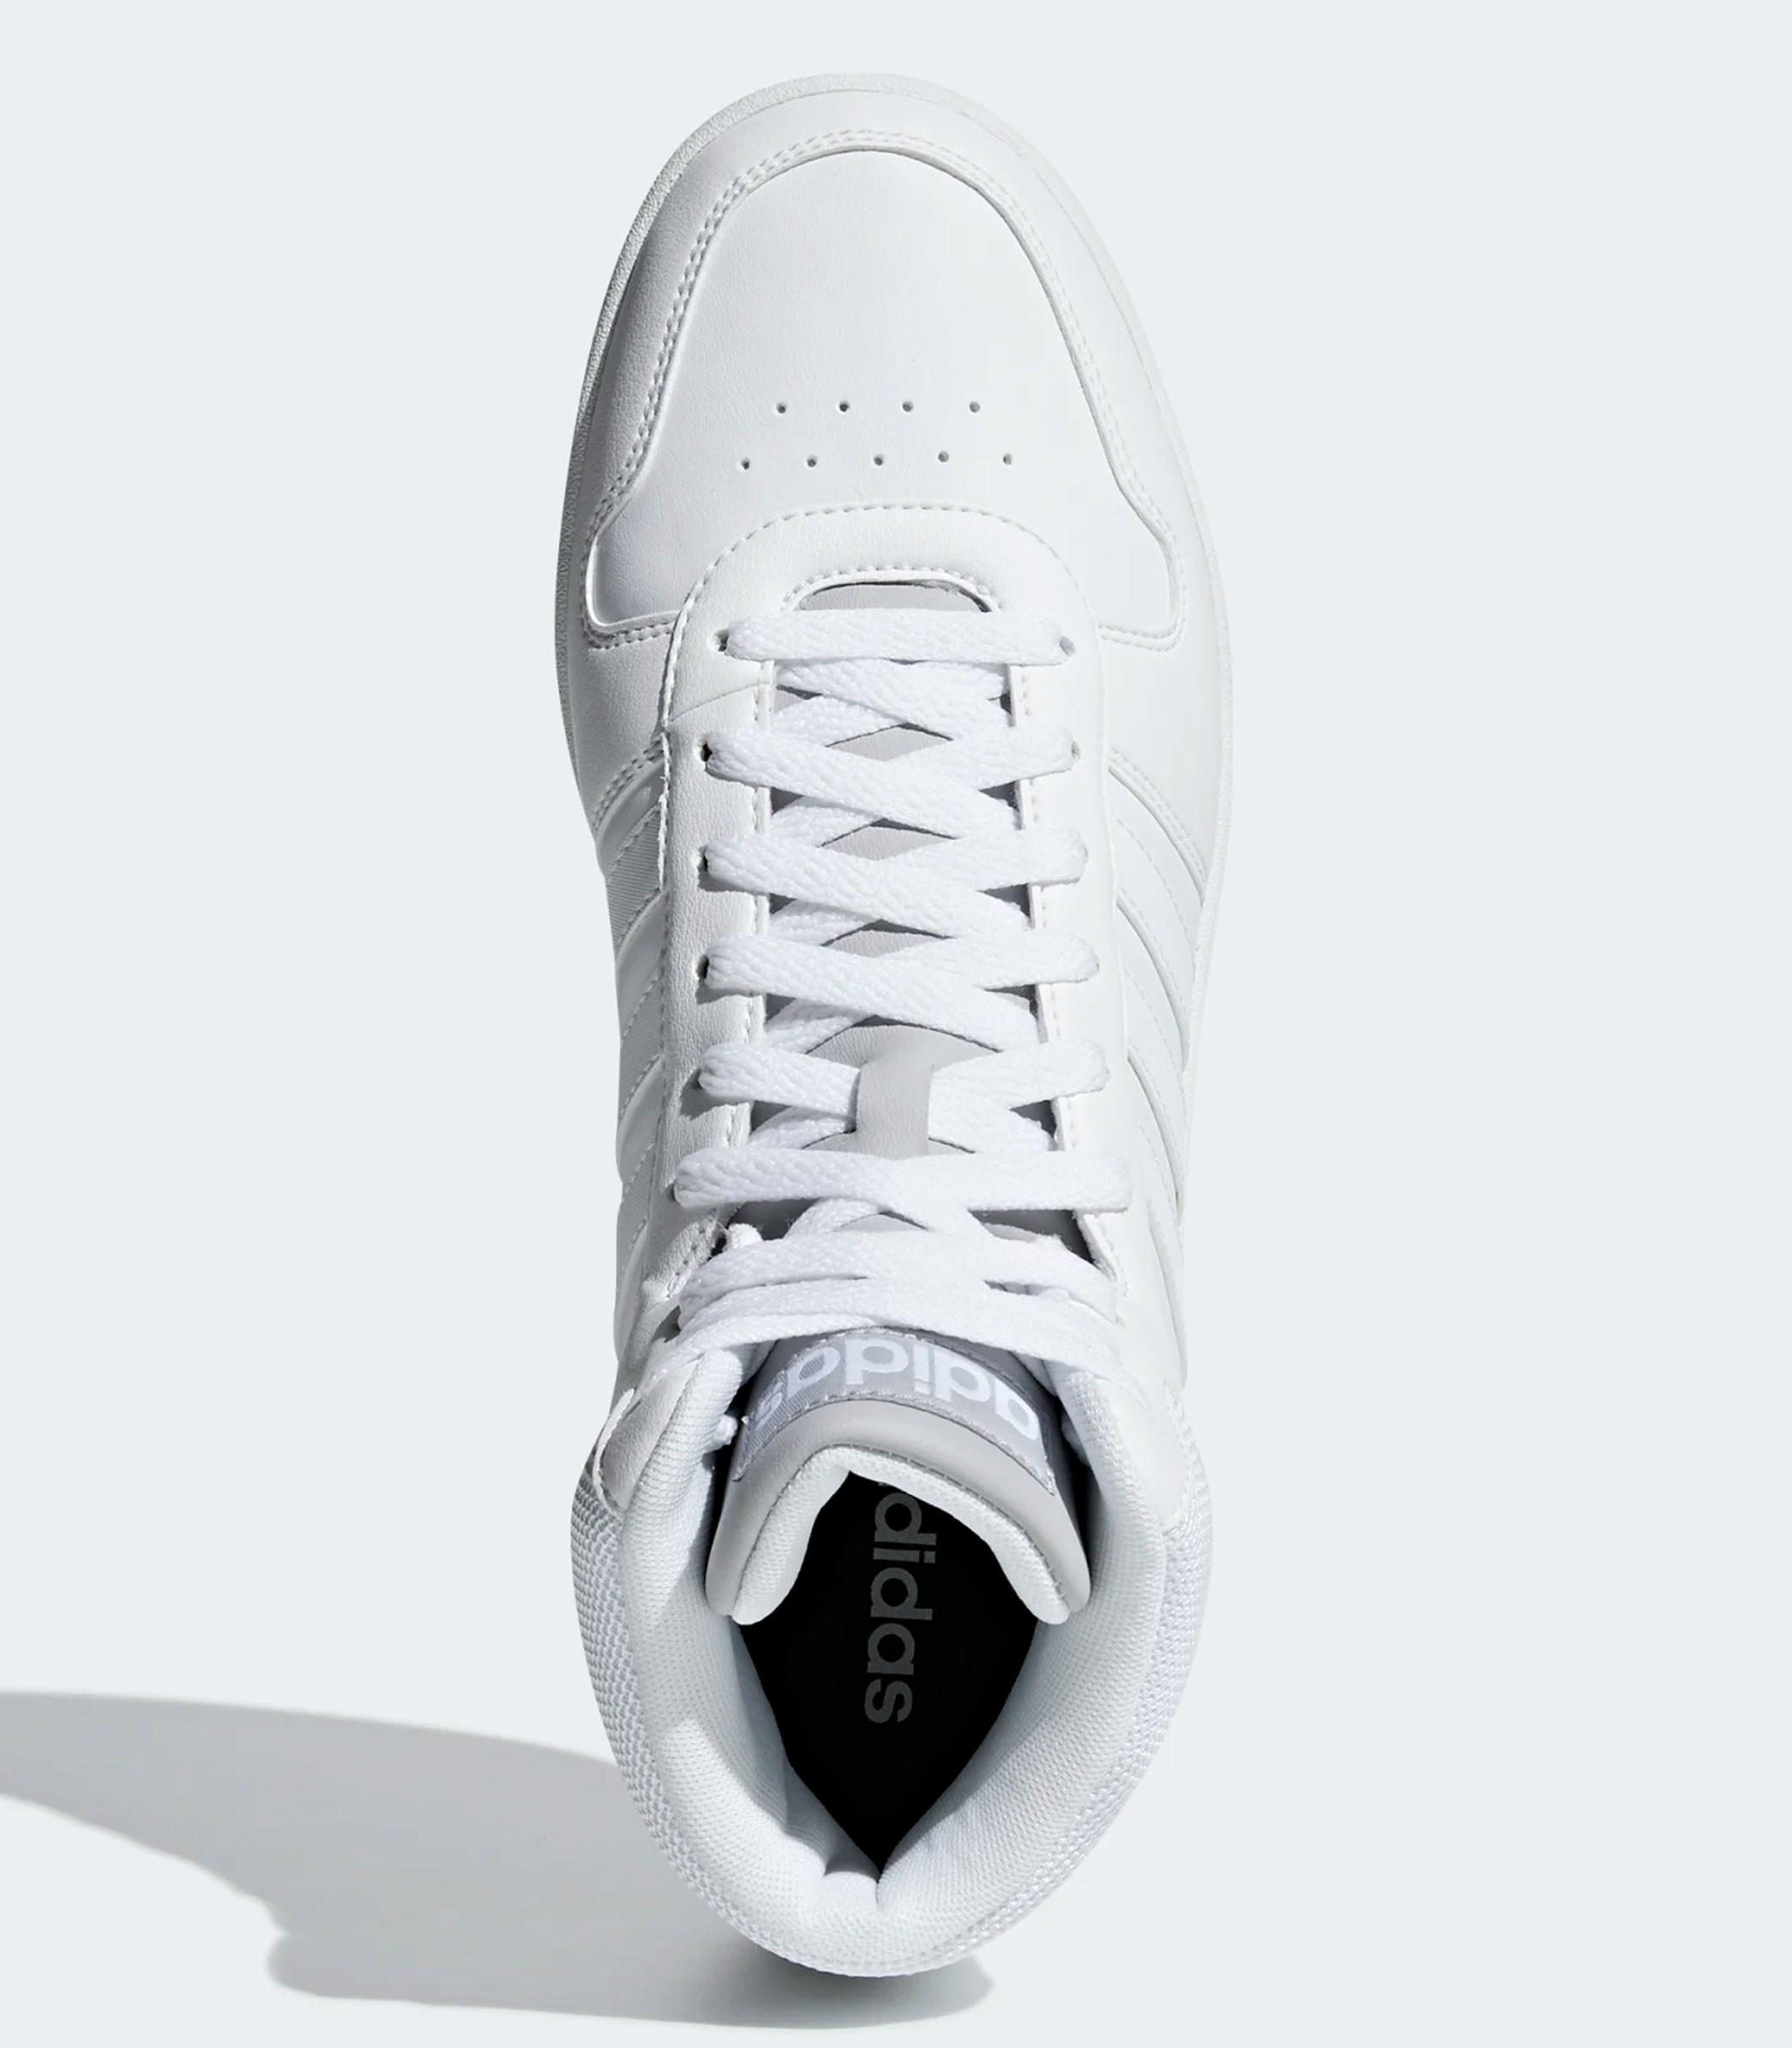 adidas hoops 2.0 bianche